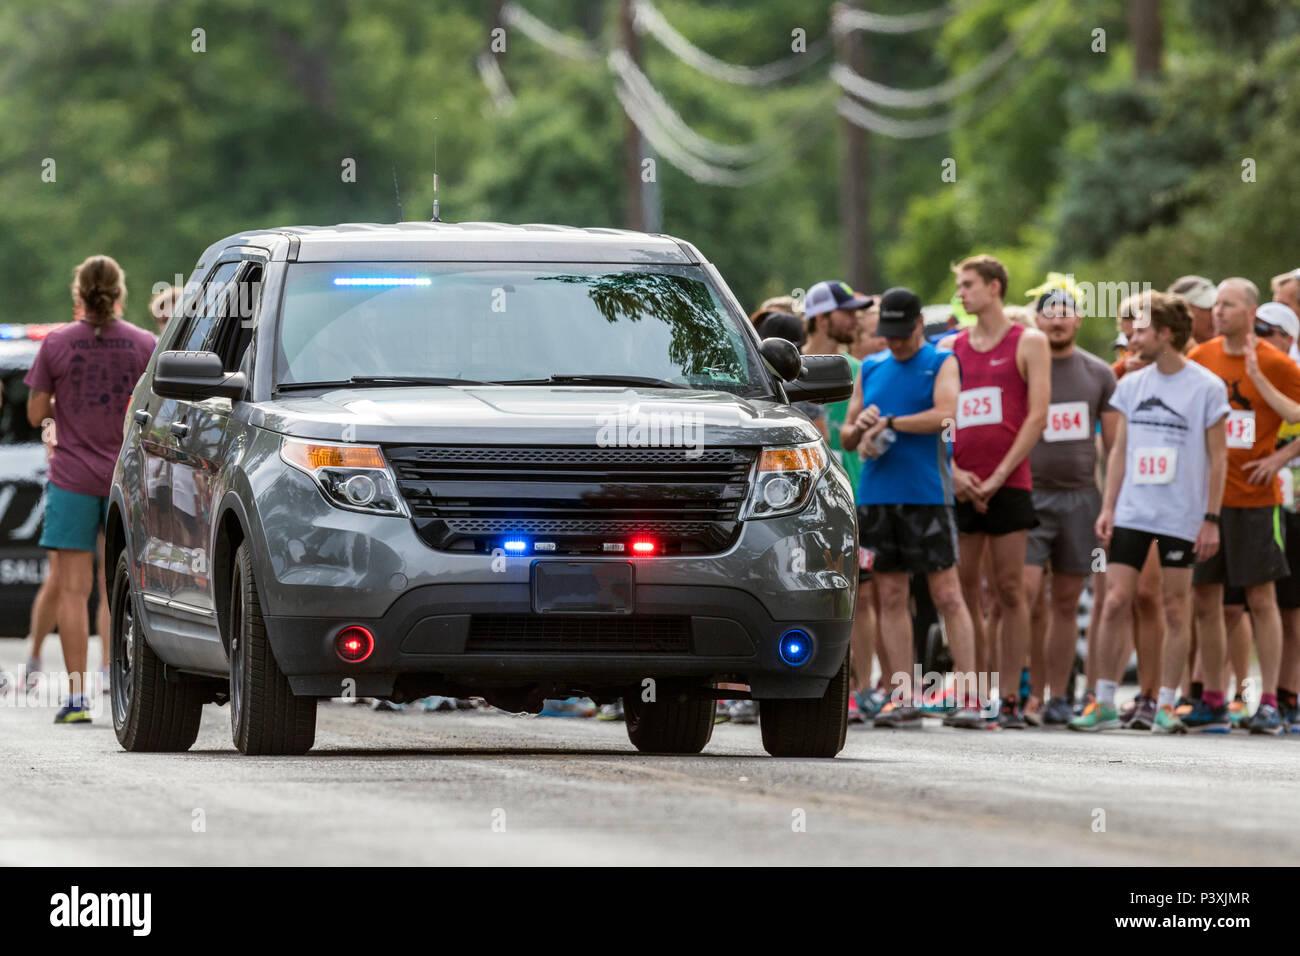 Police car leads runners in 5K & 10K foot races; annual Fibark festival; Salida; Colorado; USA - Stock Image